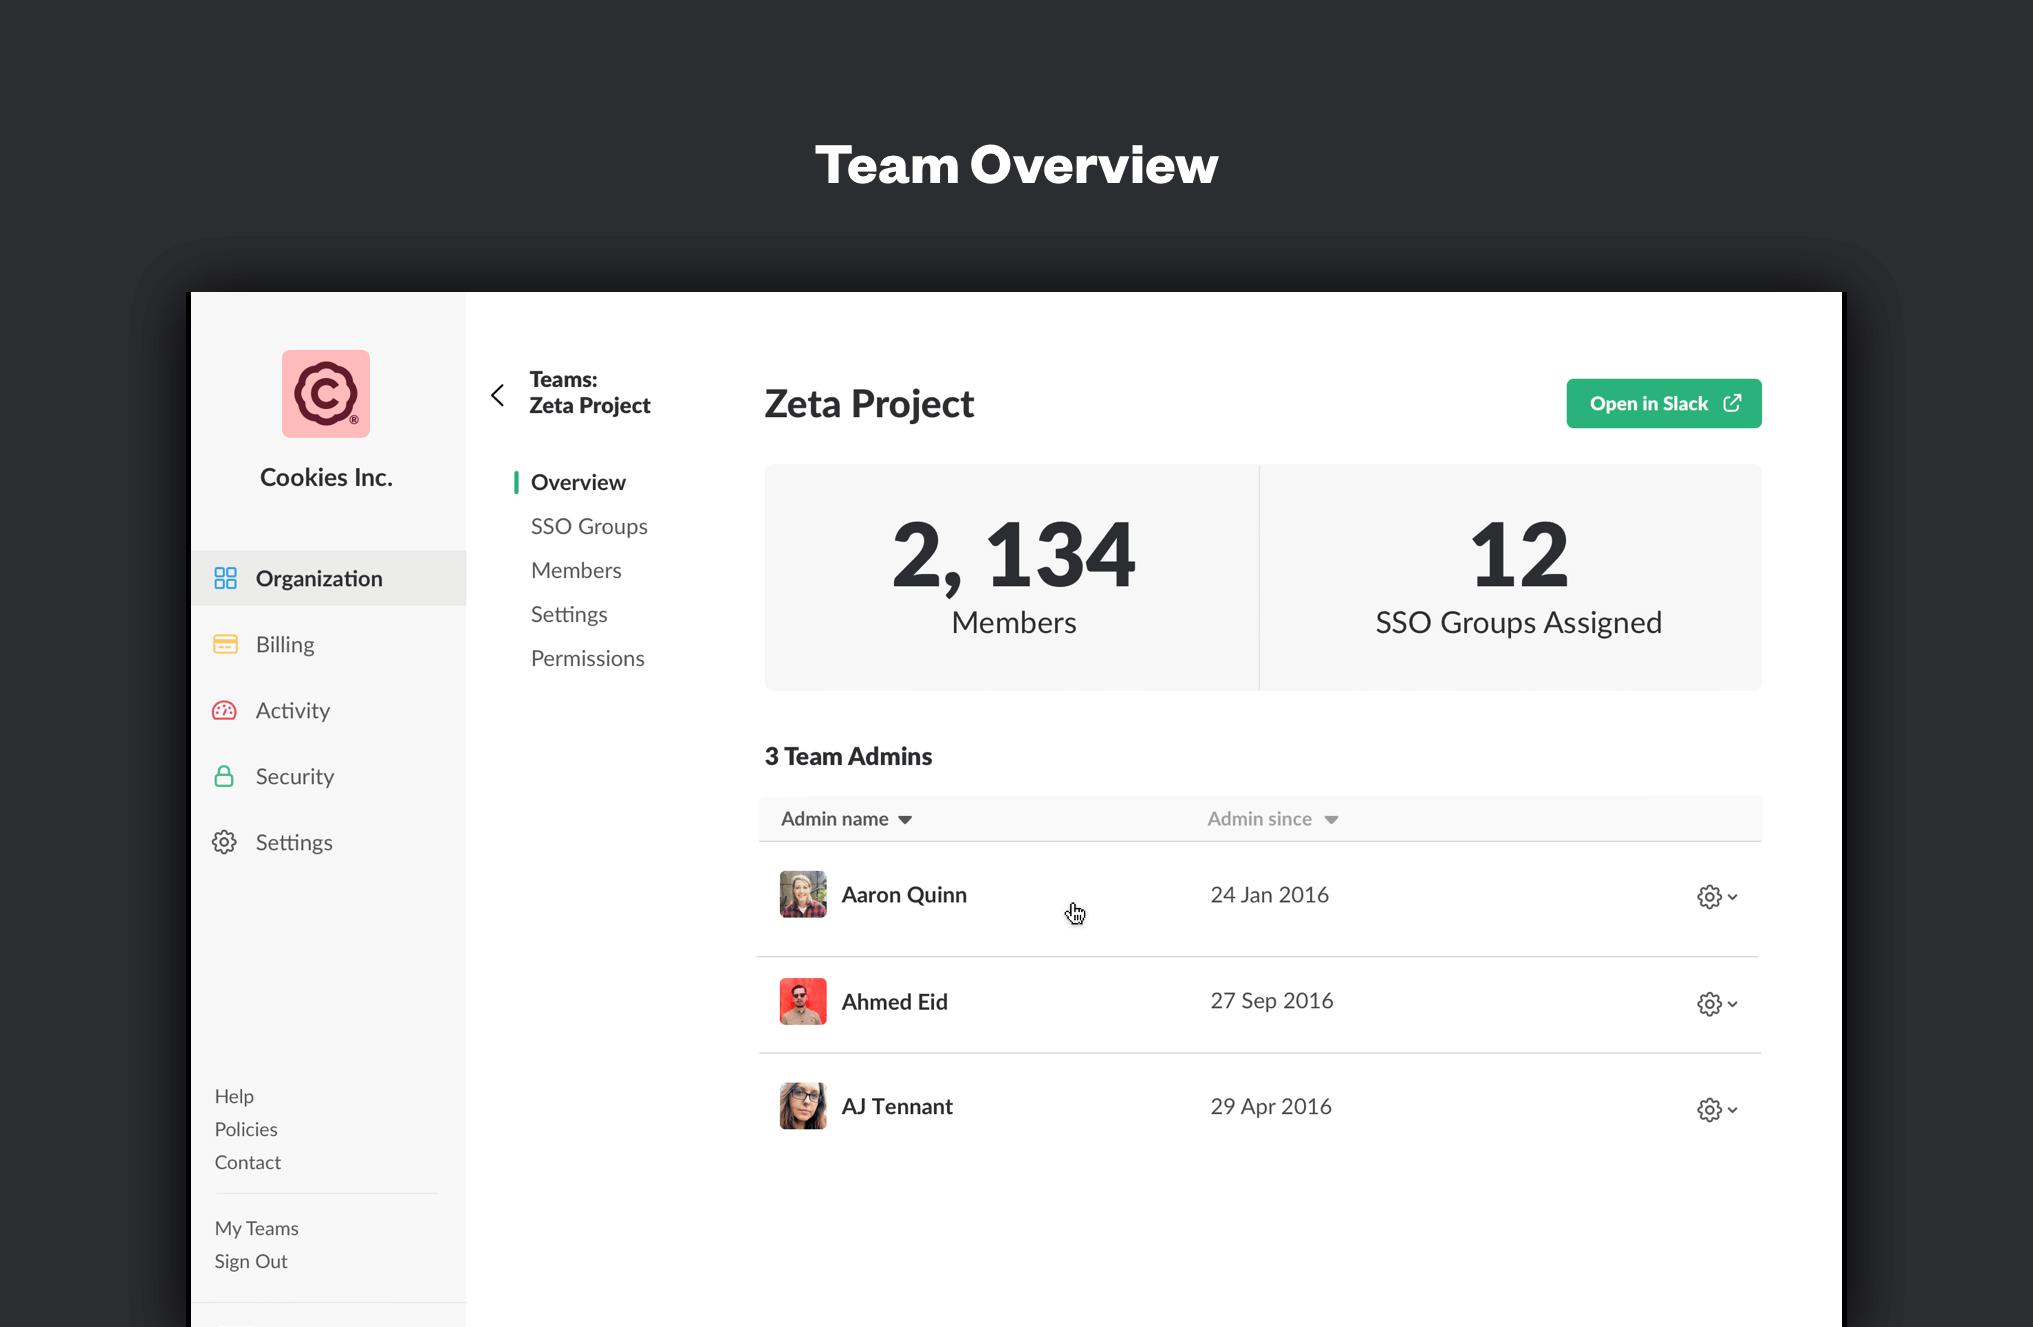 Showcasing team overviews within Slack's Enterprise Grid.